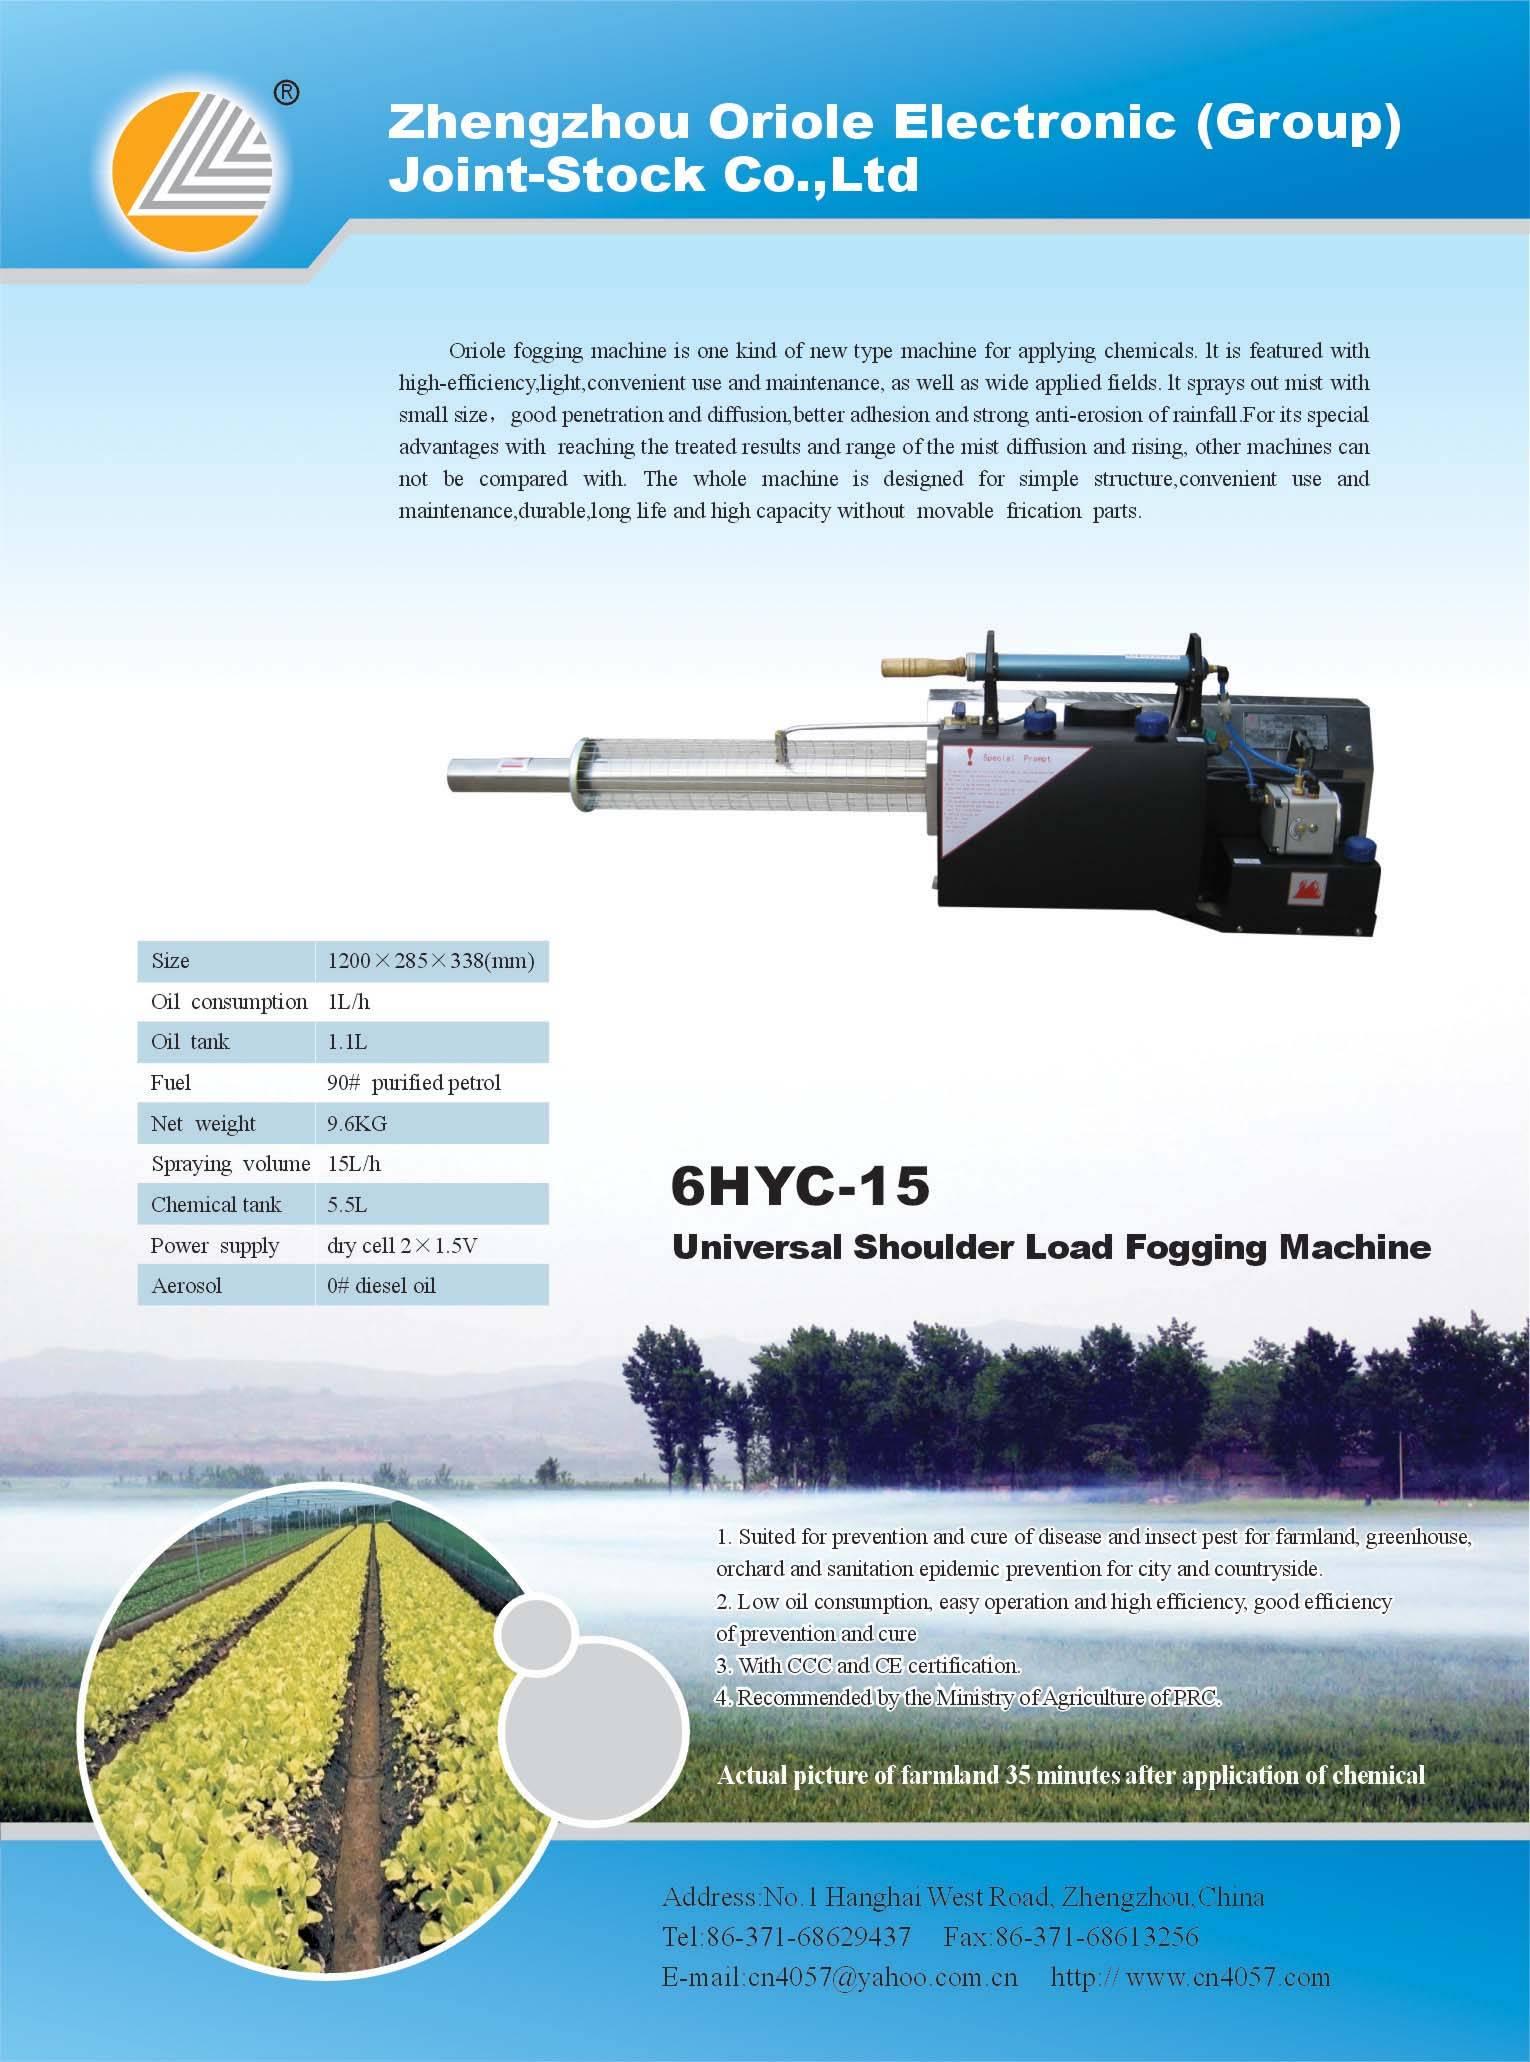 Thermal fogging machine for pest control (Dry fog generator)